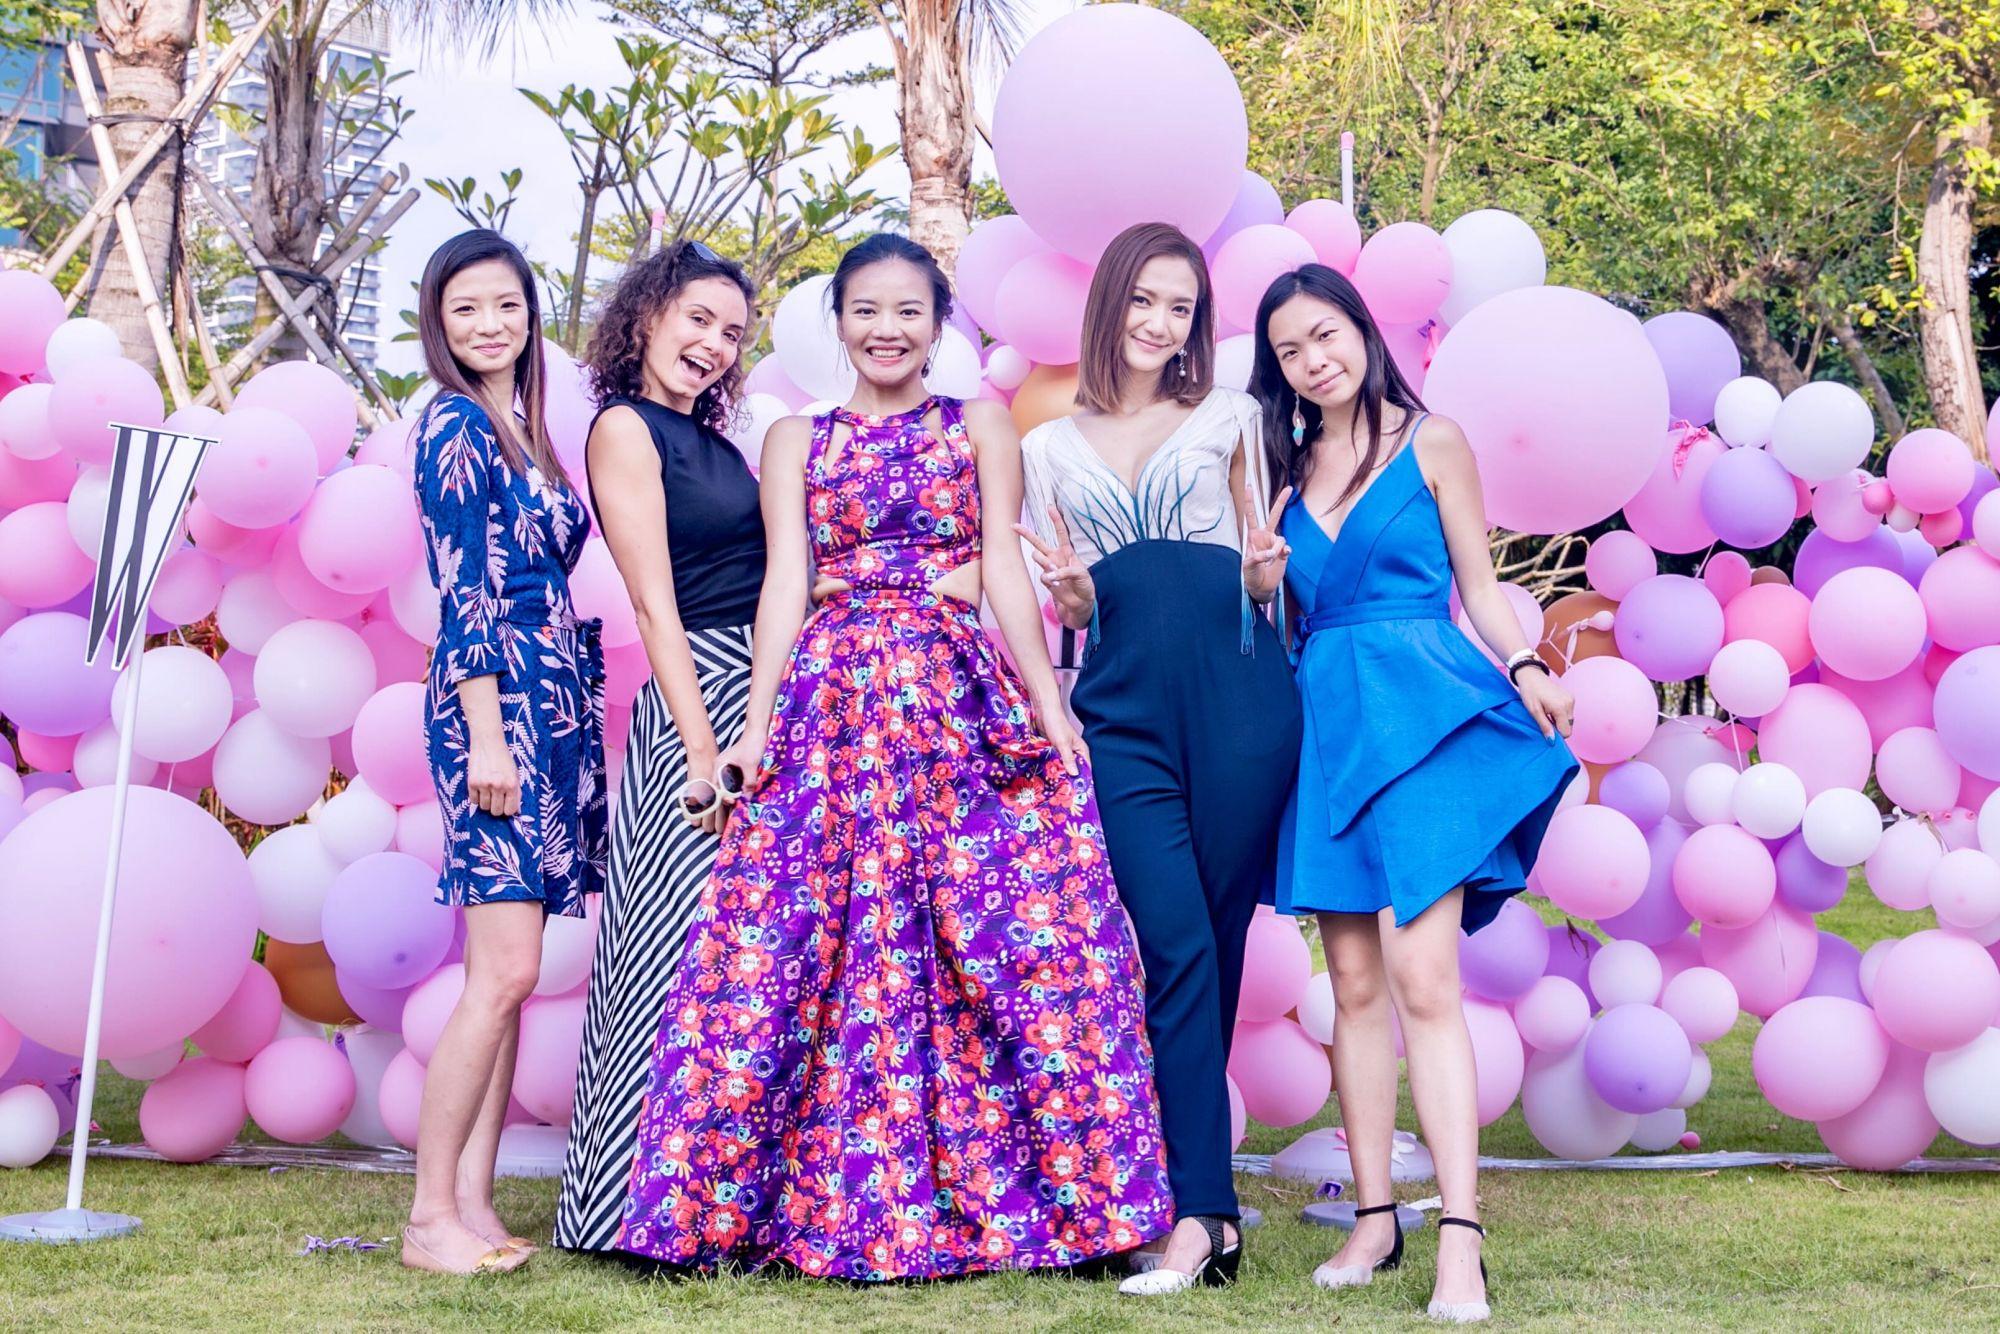 Joanna Lui Hickox, Ines Gafsi, Anna Wong, Grace Wong, Vivian Man